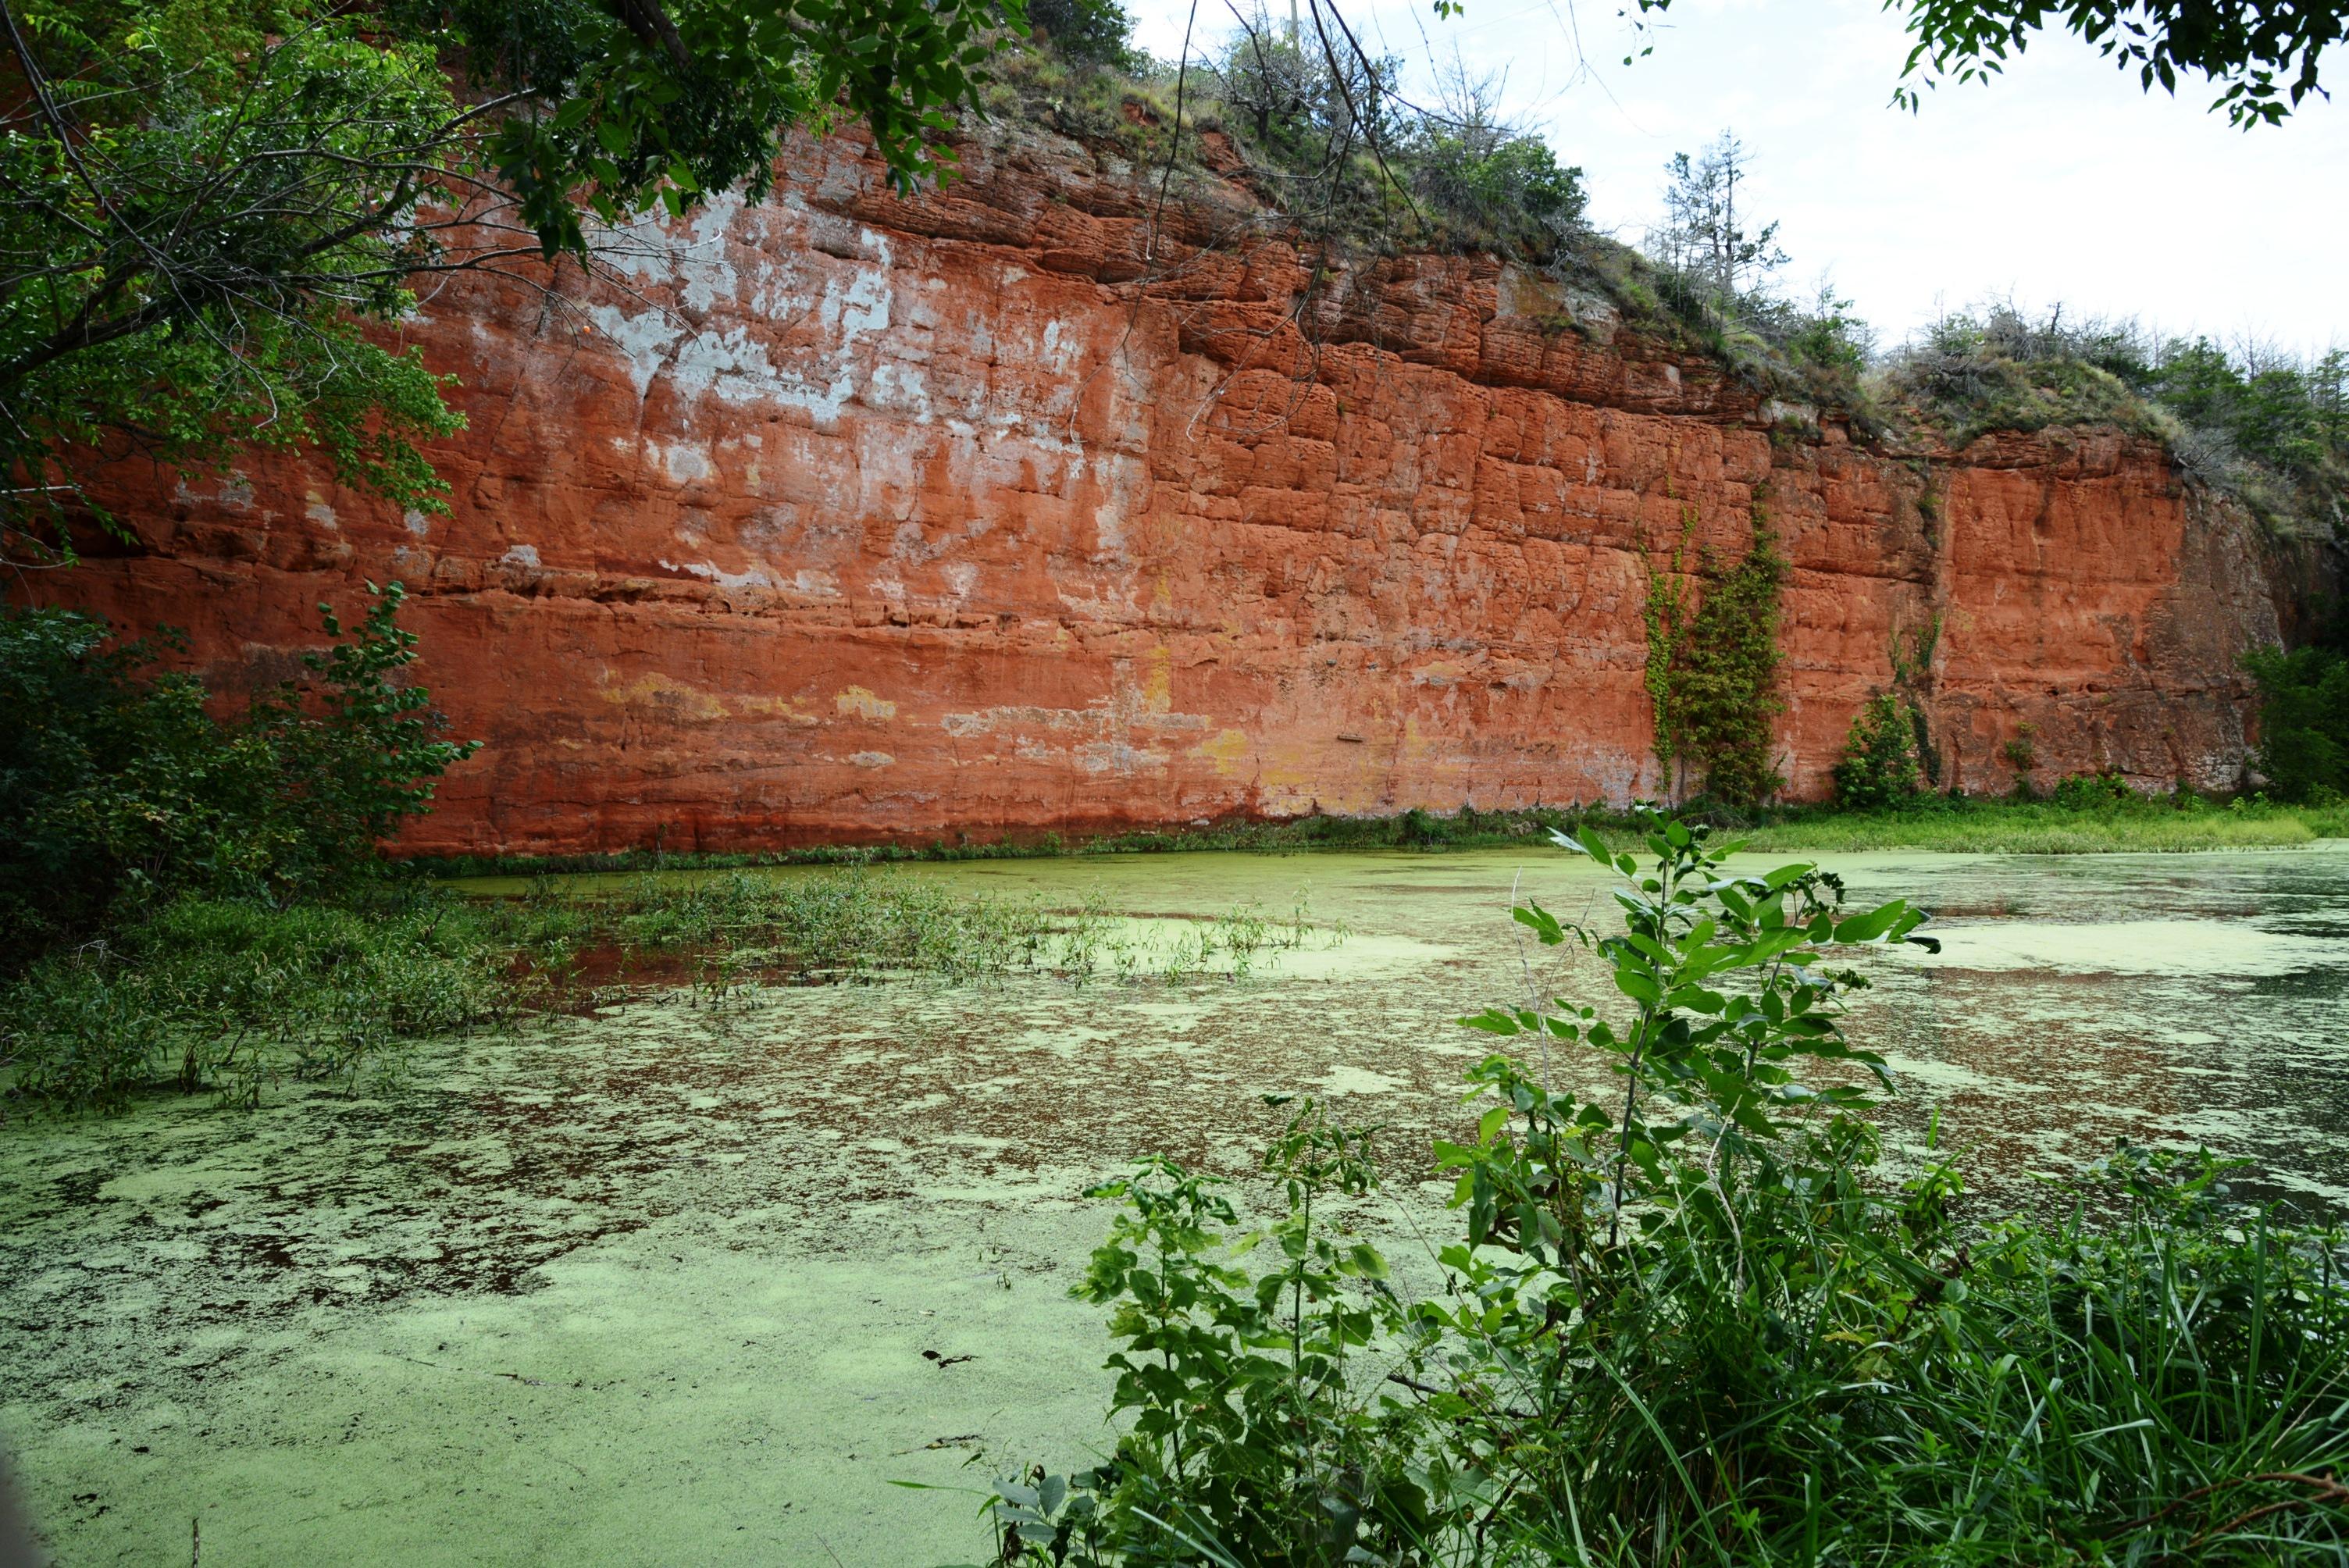 Marsh at Red Rock Canyon